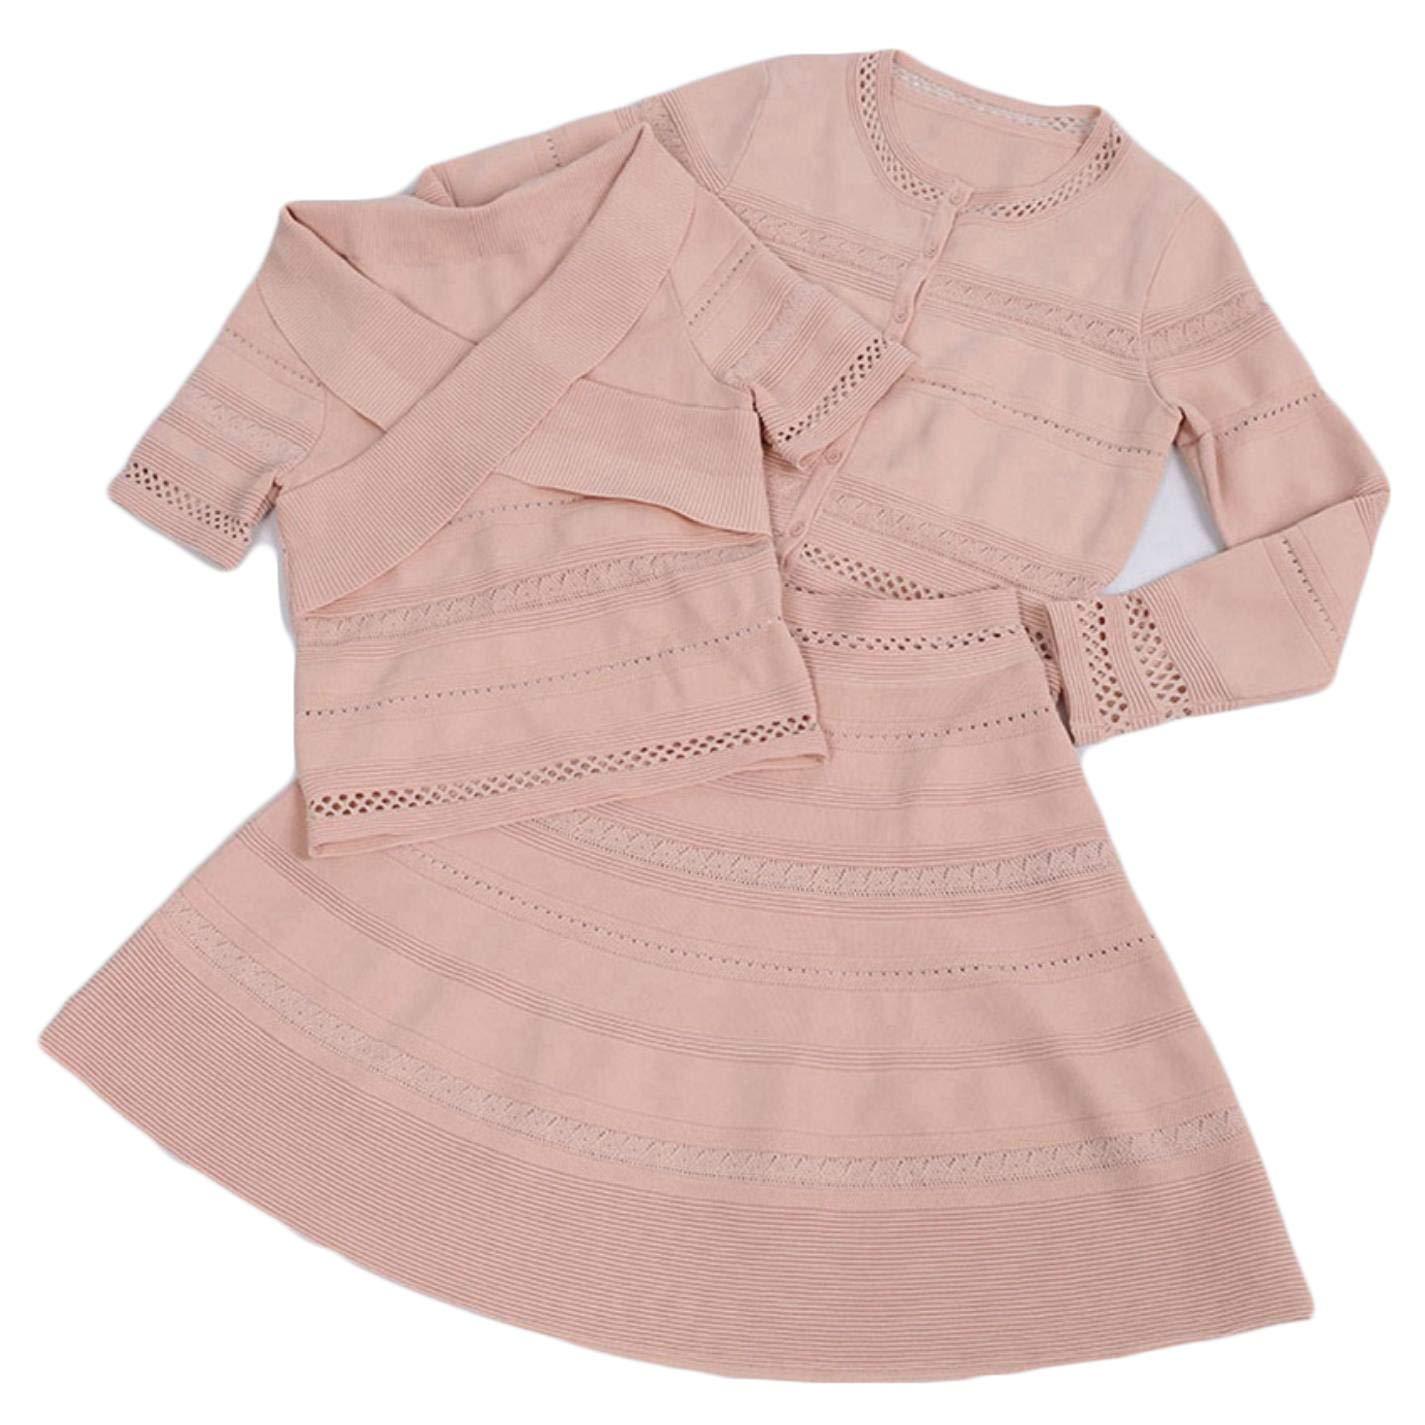 NMKfWroU Women Single Breasted Cardigan Wrap Short Sleeve Tops Knee Length Skirt